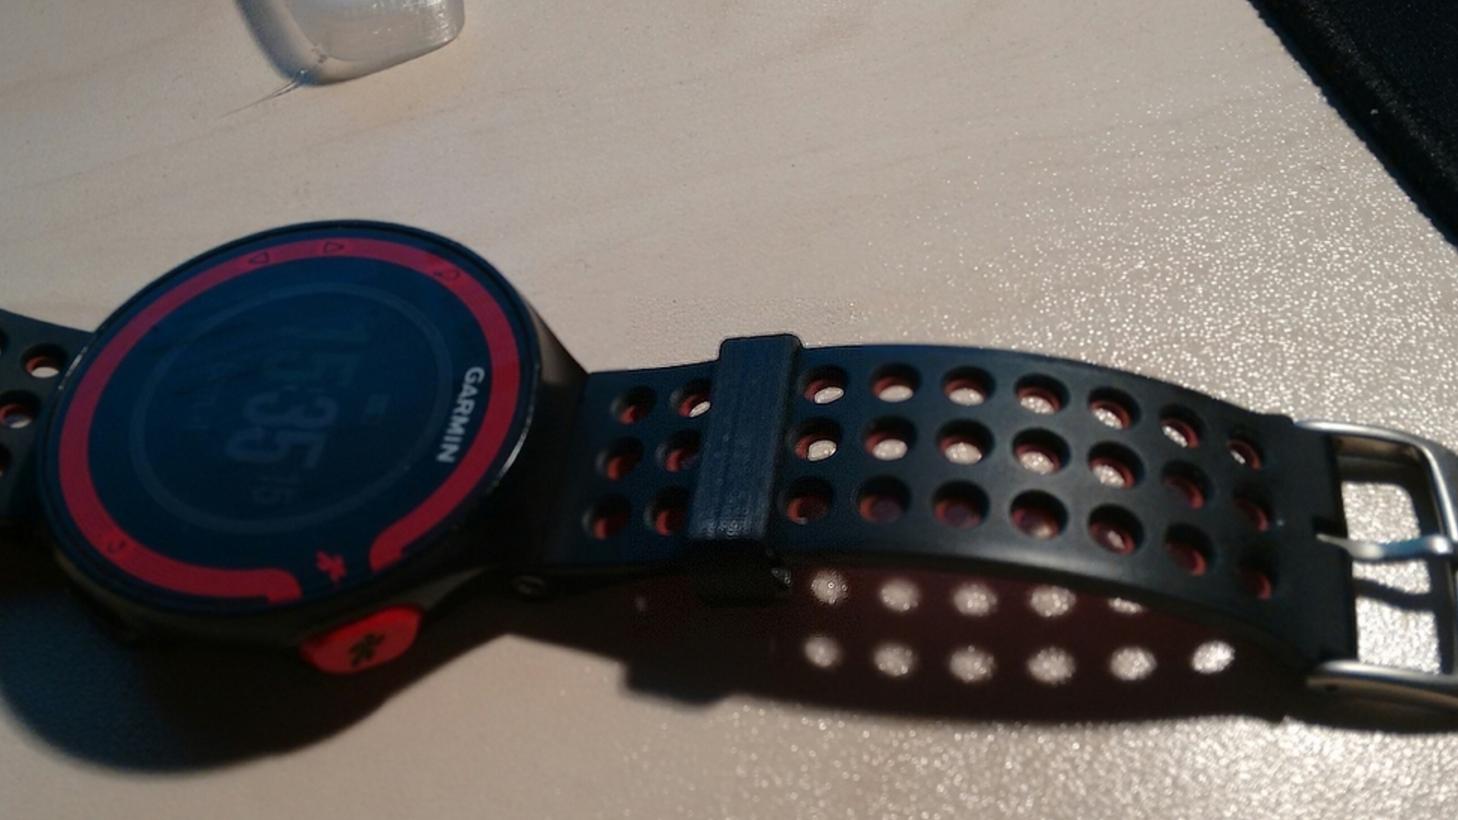 Capture d'écran 2017-05-05 à 16.50.51.png Download free STL file Buckle for Garmin 220 watch bracelet • 3D printable design, Julien_DaCosta